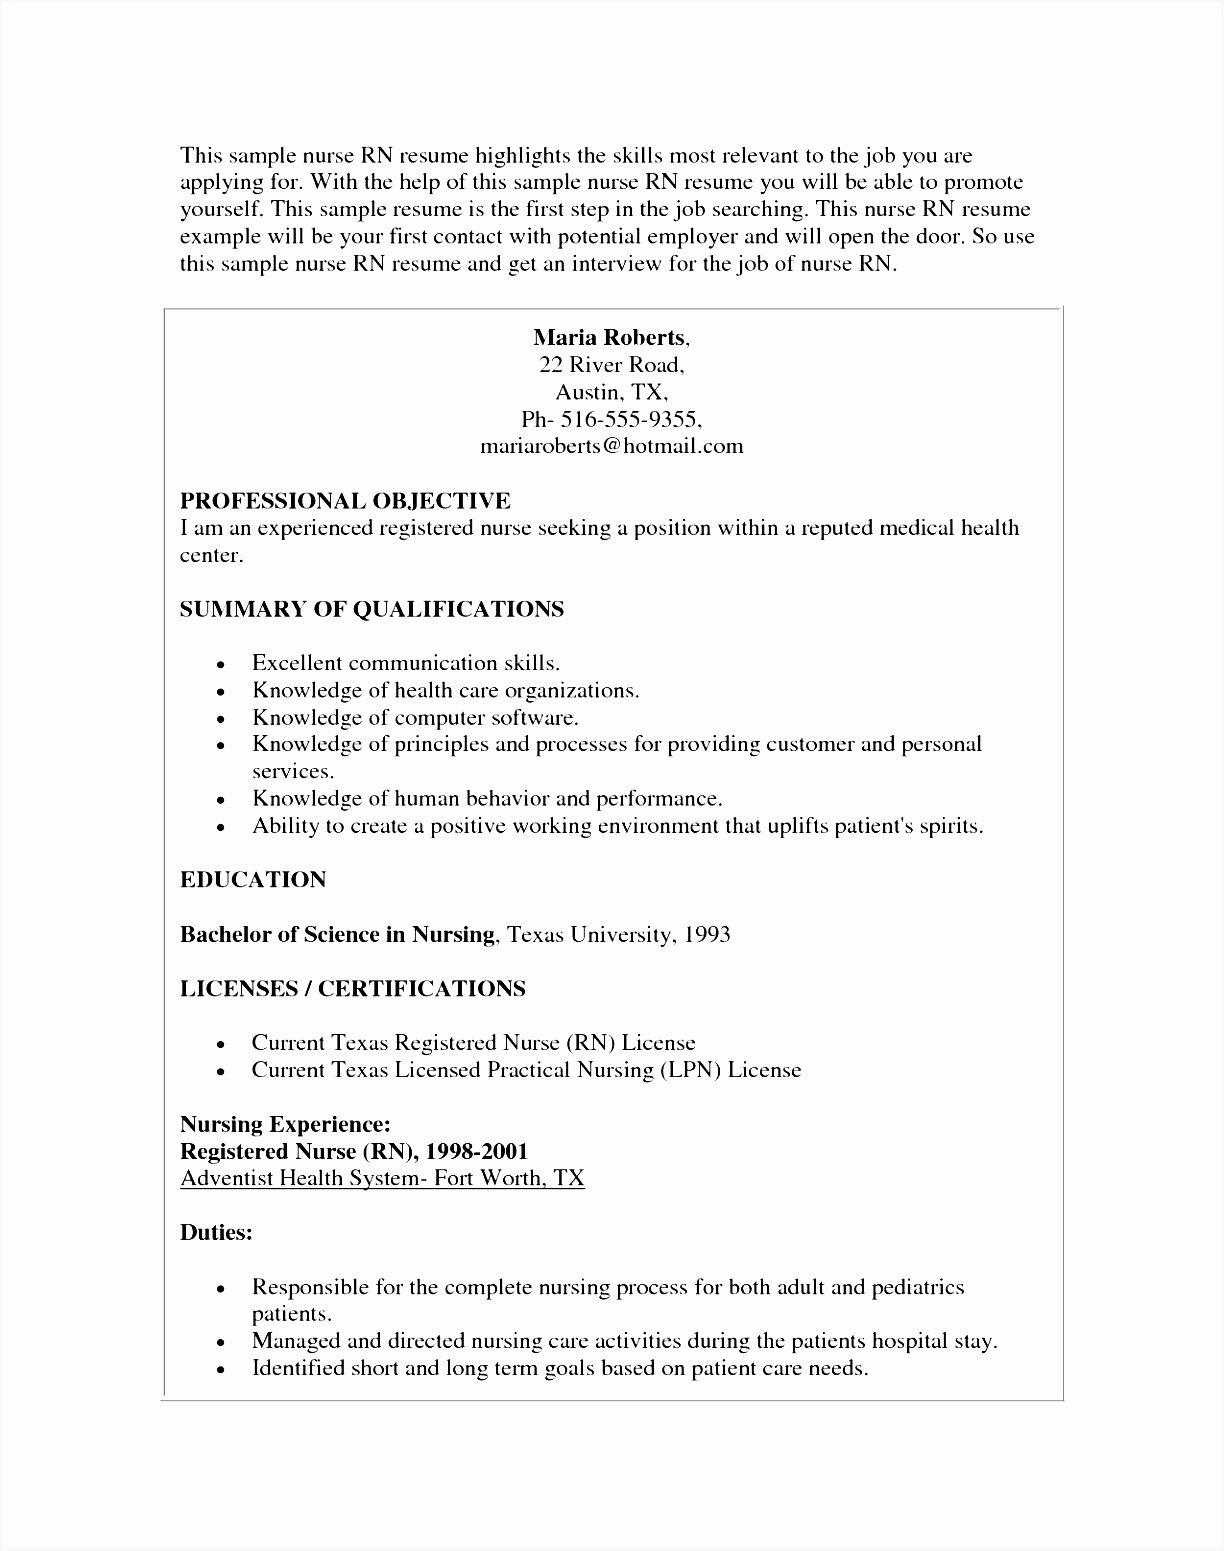 Curriculum Vitae Nursing Template Inspirational 7 Cv Template Nursing